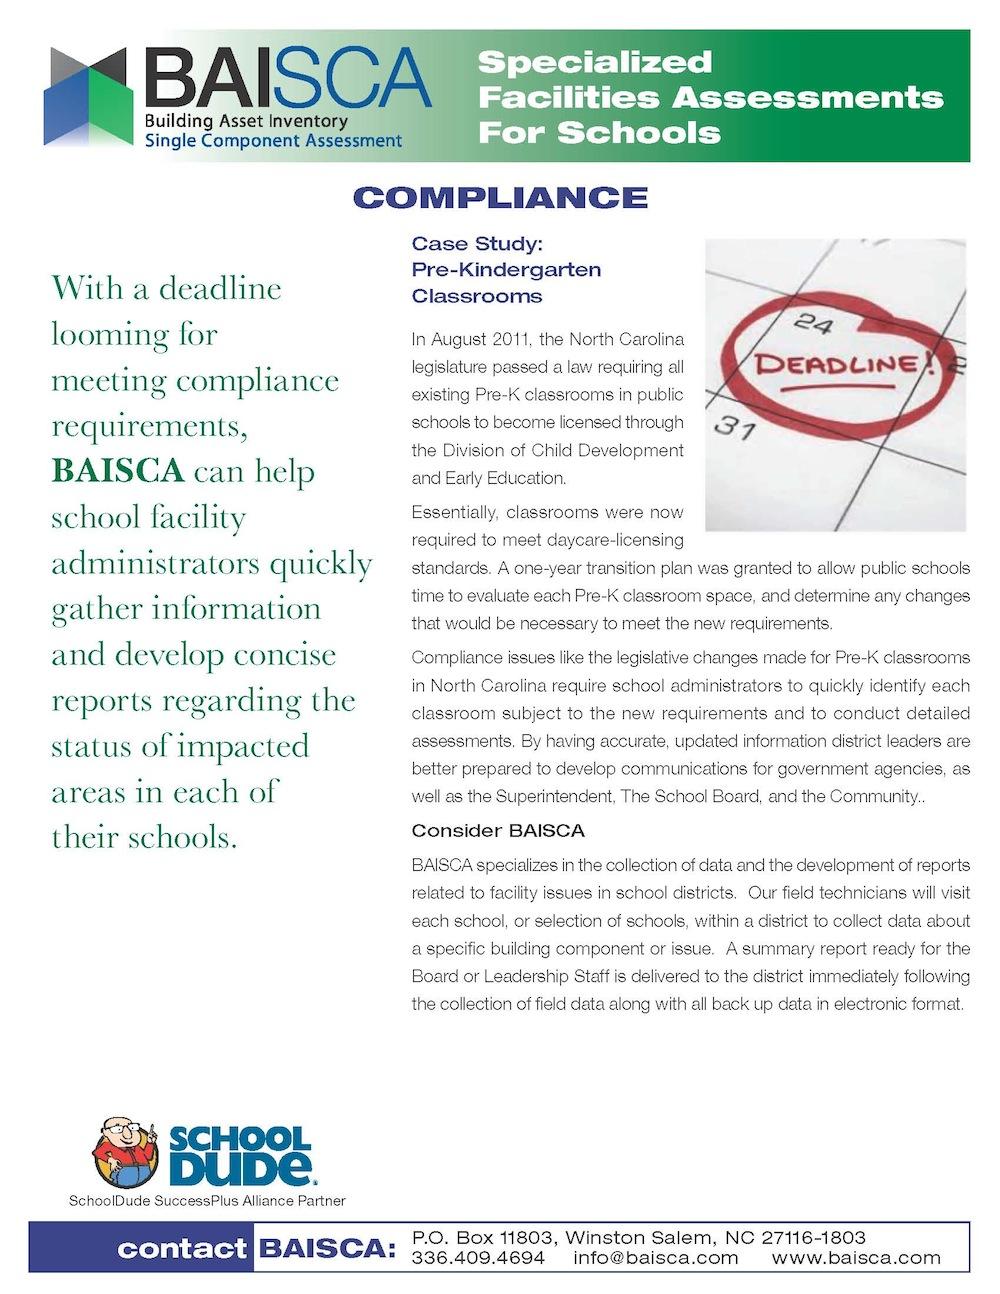 BAISCA_Compliance_1000